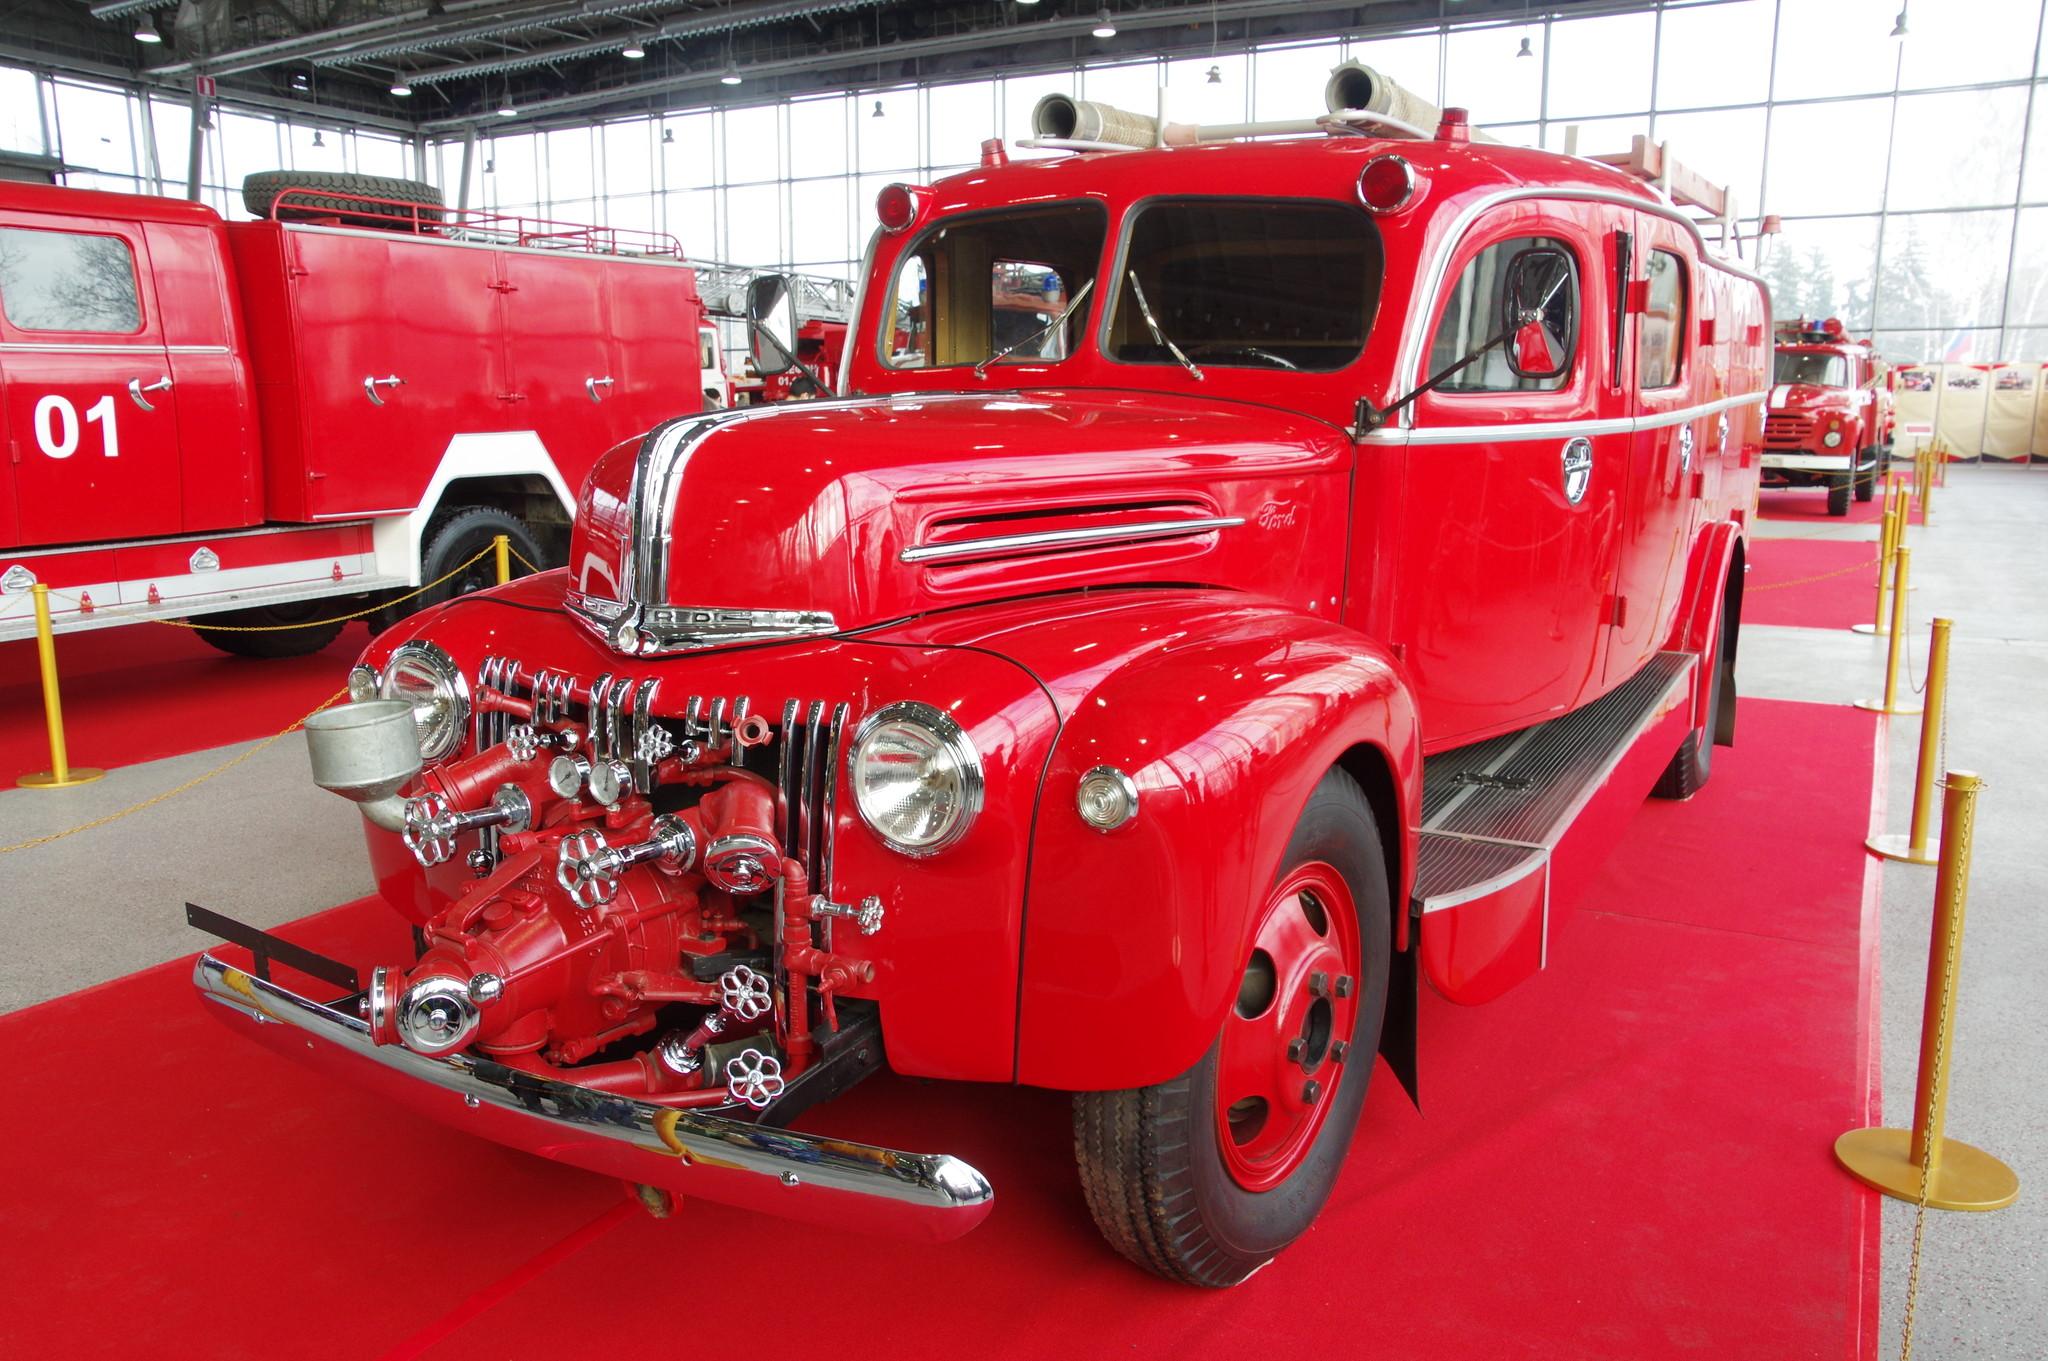 Пожарный автомобиль Ford 798T (1947 г.)